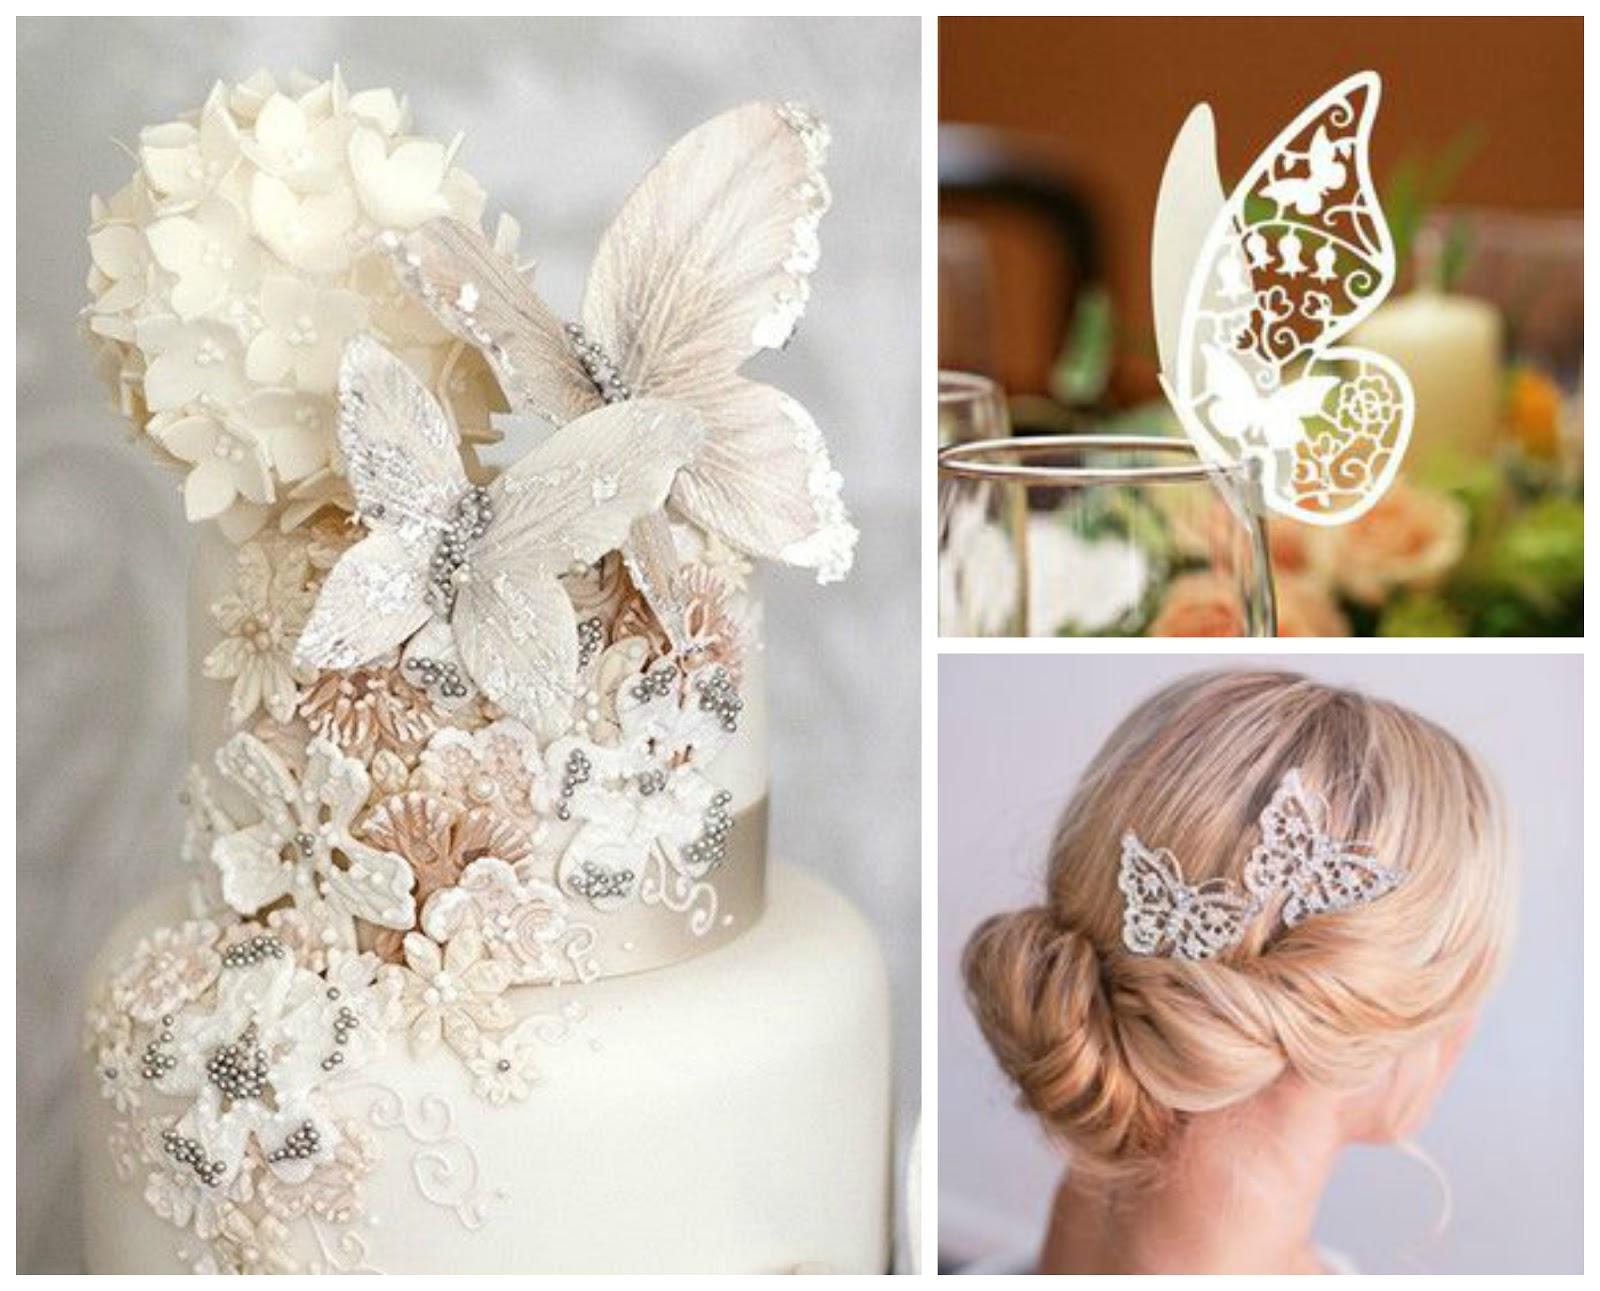 Matrimonio Tema Farfalle : Matrimonio ecologico tutto per il a tema farfalle